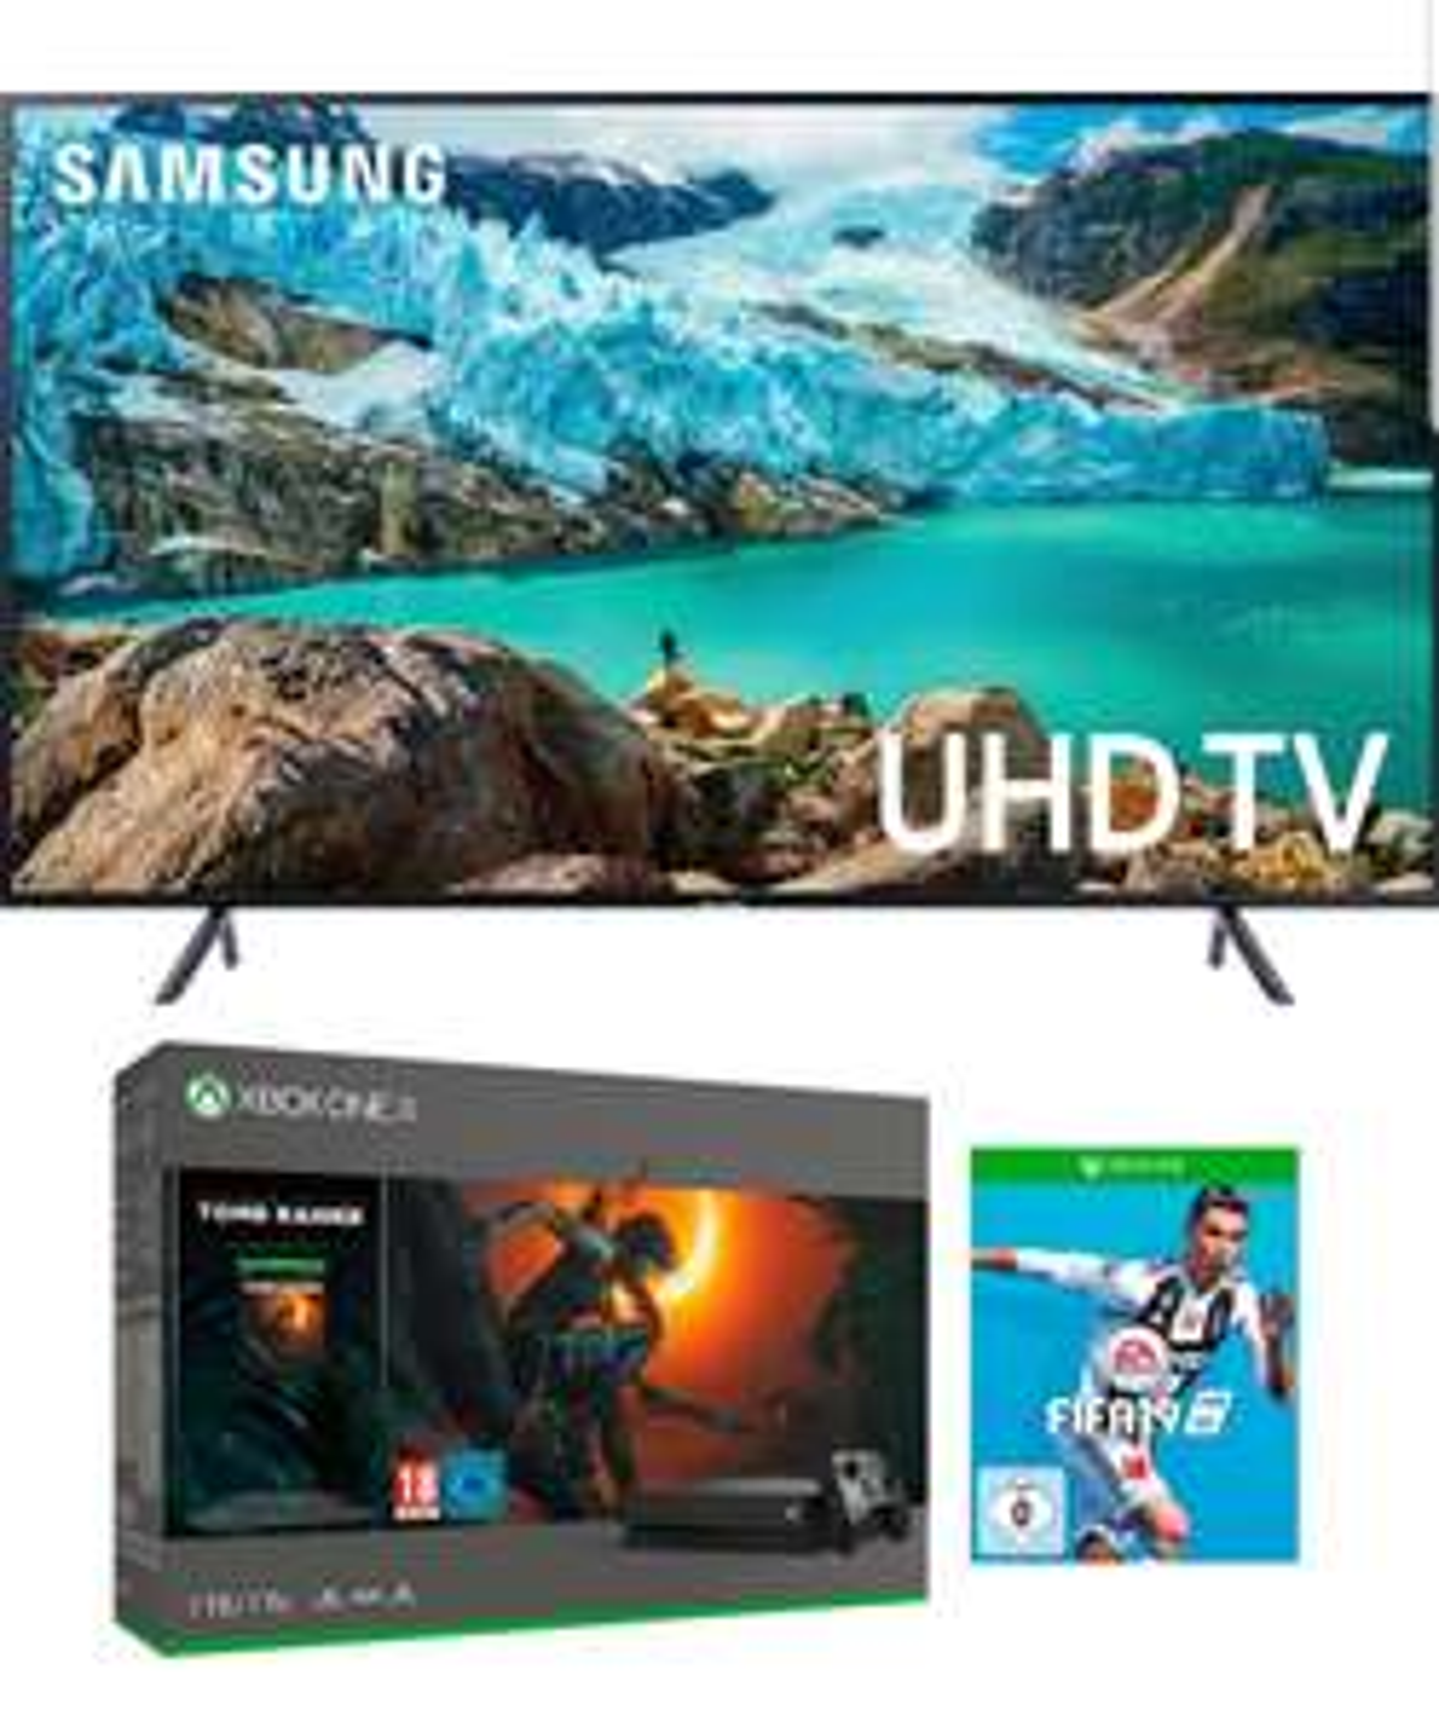 Samsung UE55RU7179 LED 4k TV + Xbox One X + Tomb Raider + FIFA 19 @ Otto